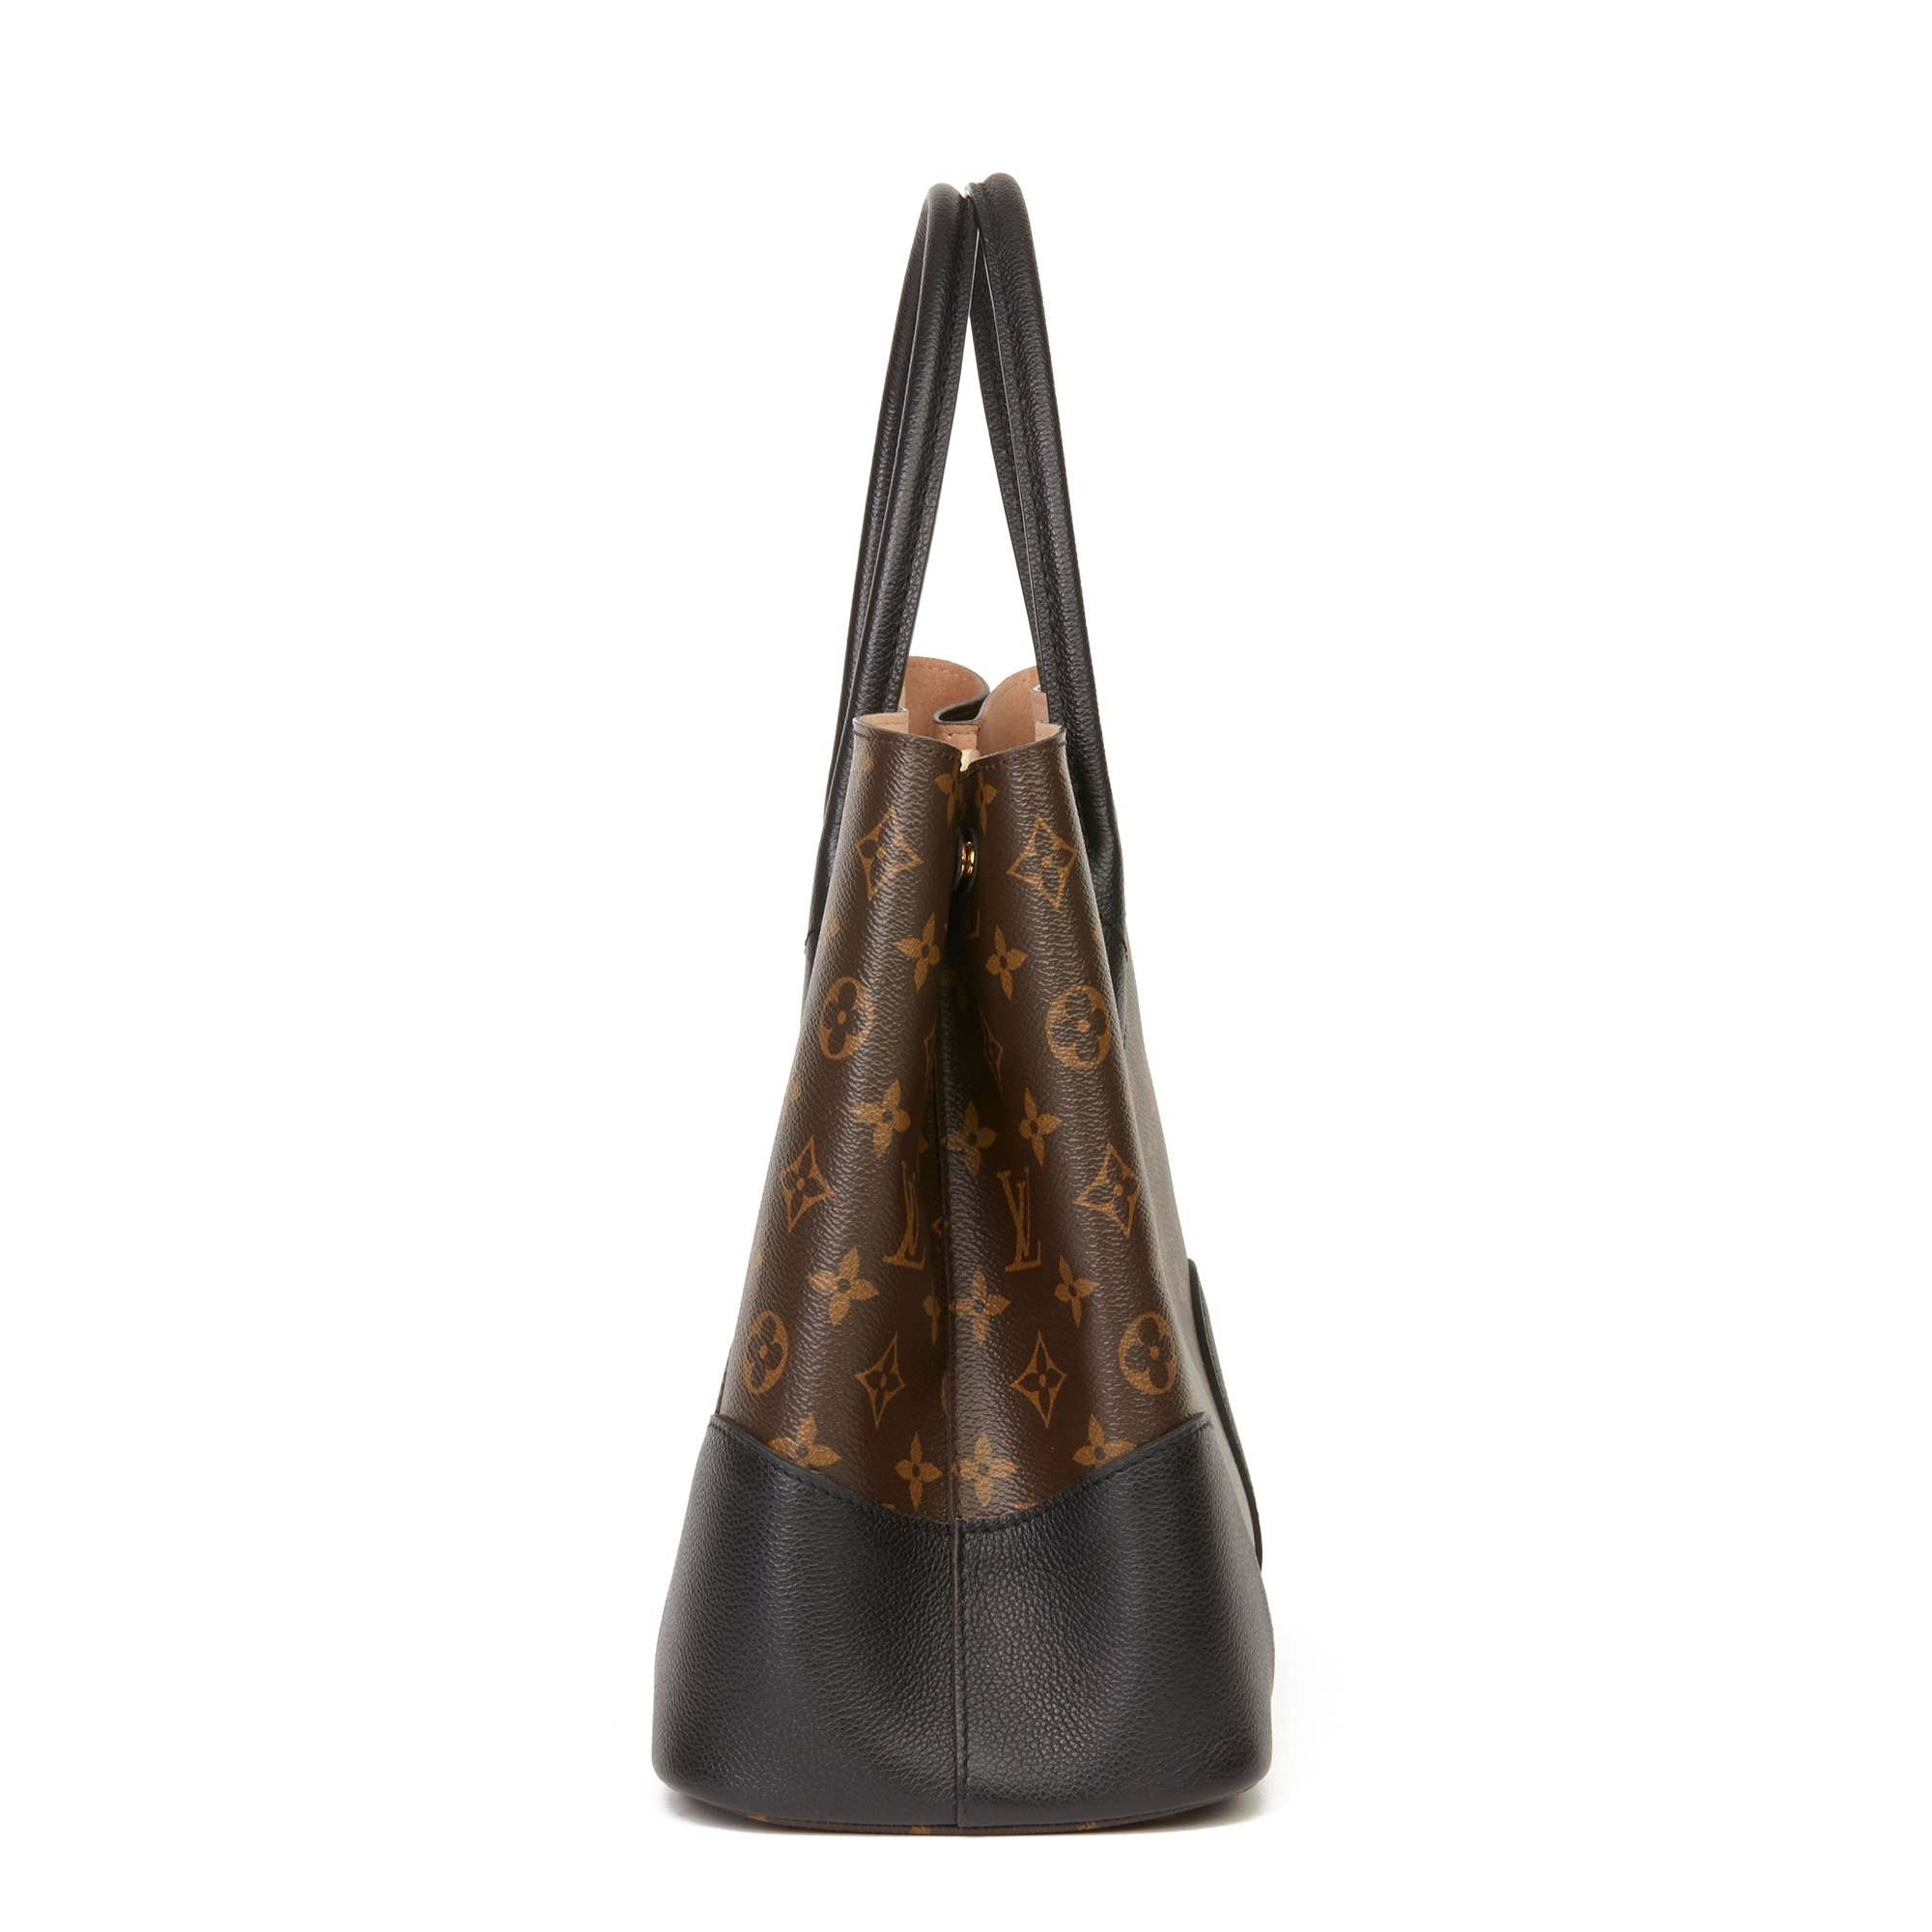 Louis Vuitton Brown Monogram Coated Canvas & Black Calfskin Leather Flandrin